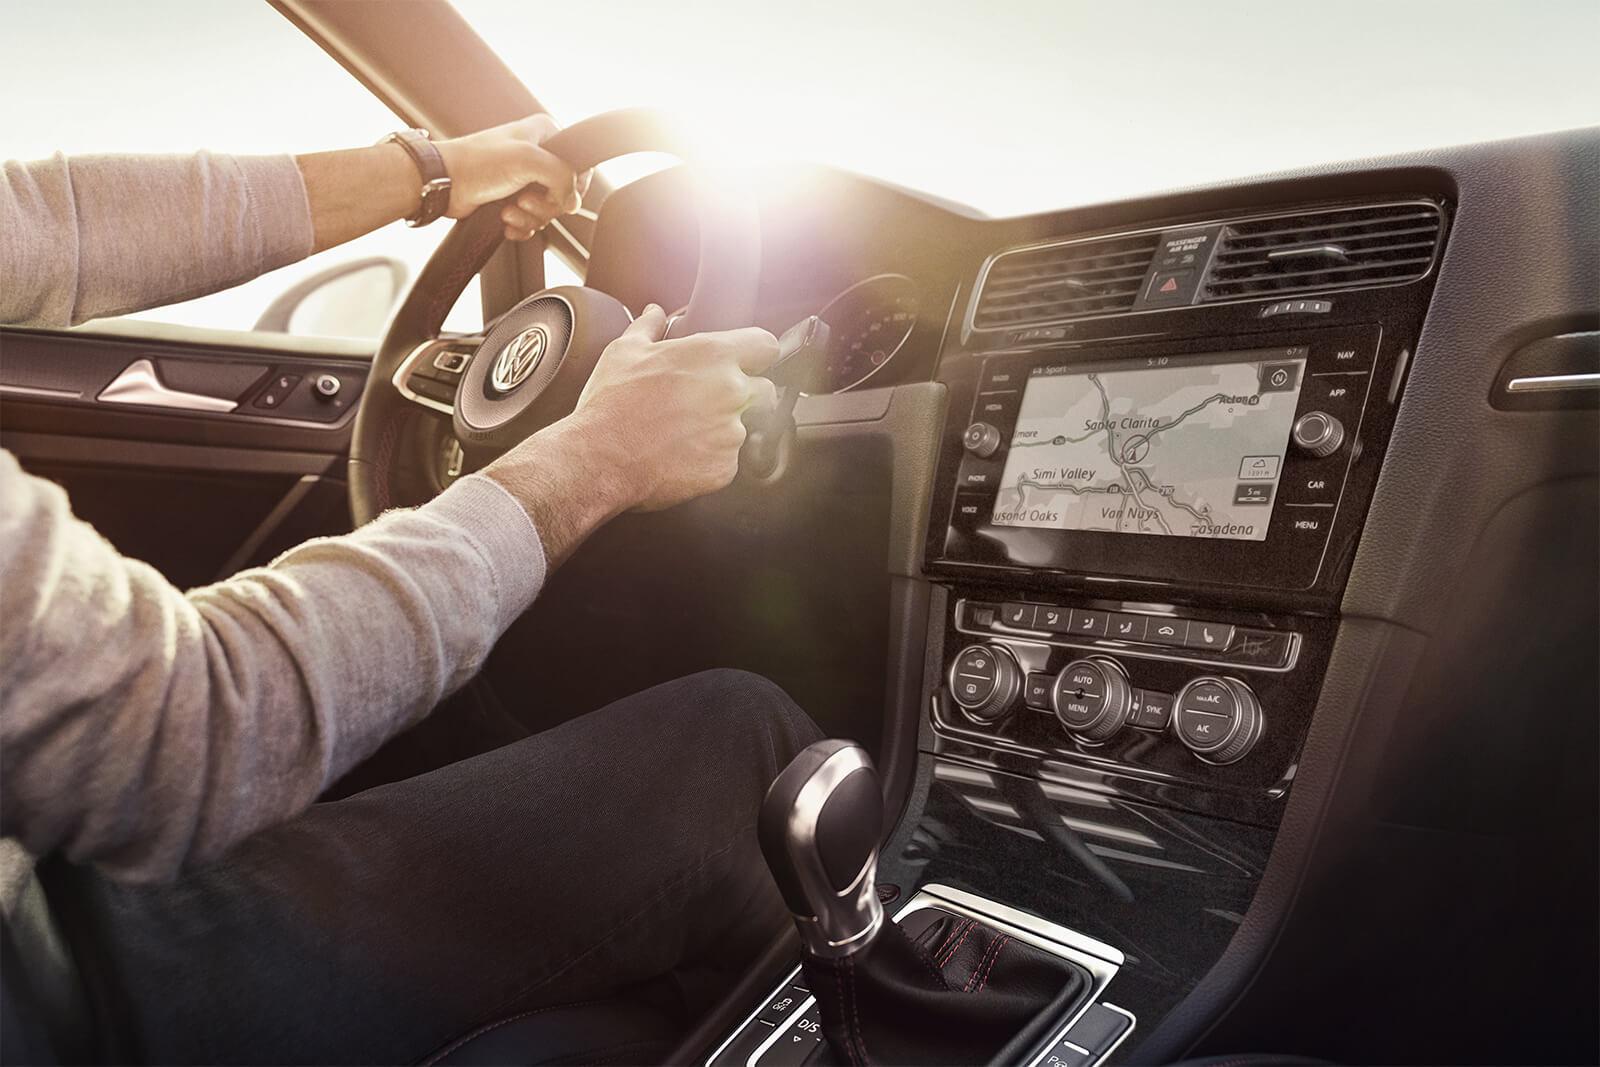 2020 VW Golf GTI Technology